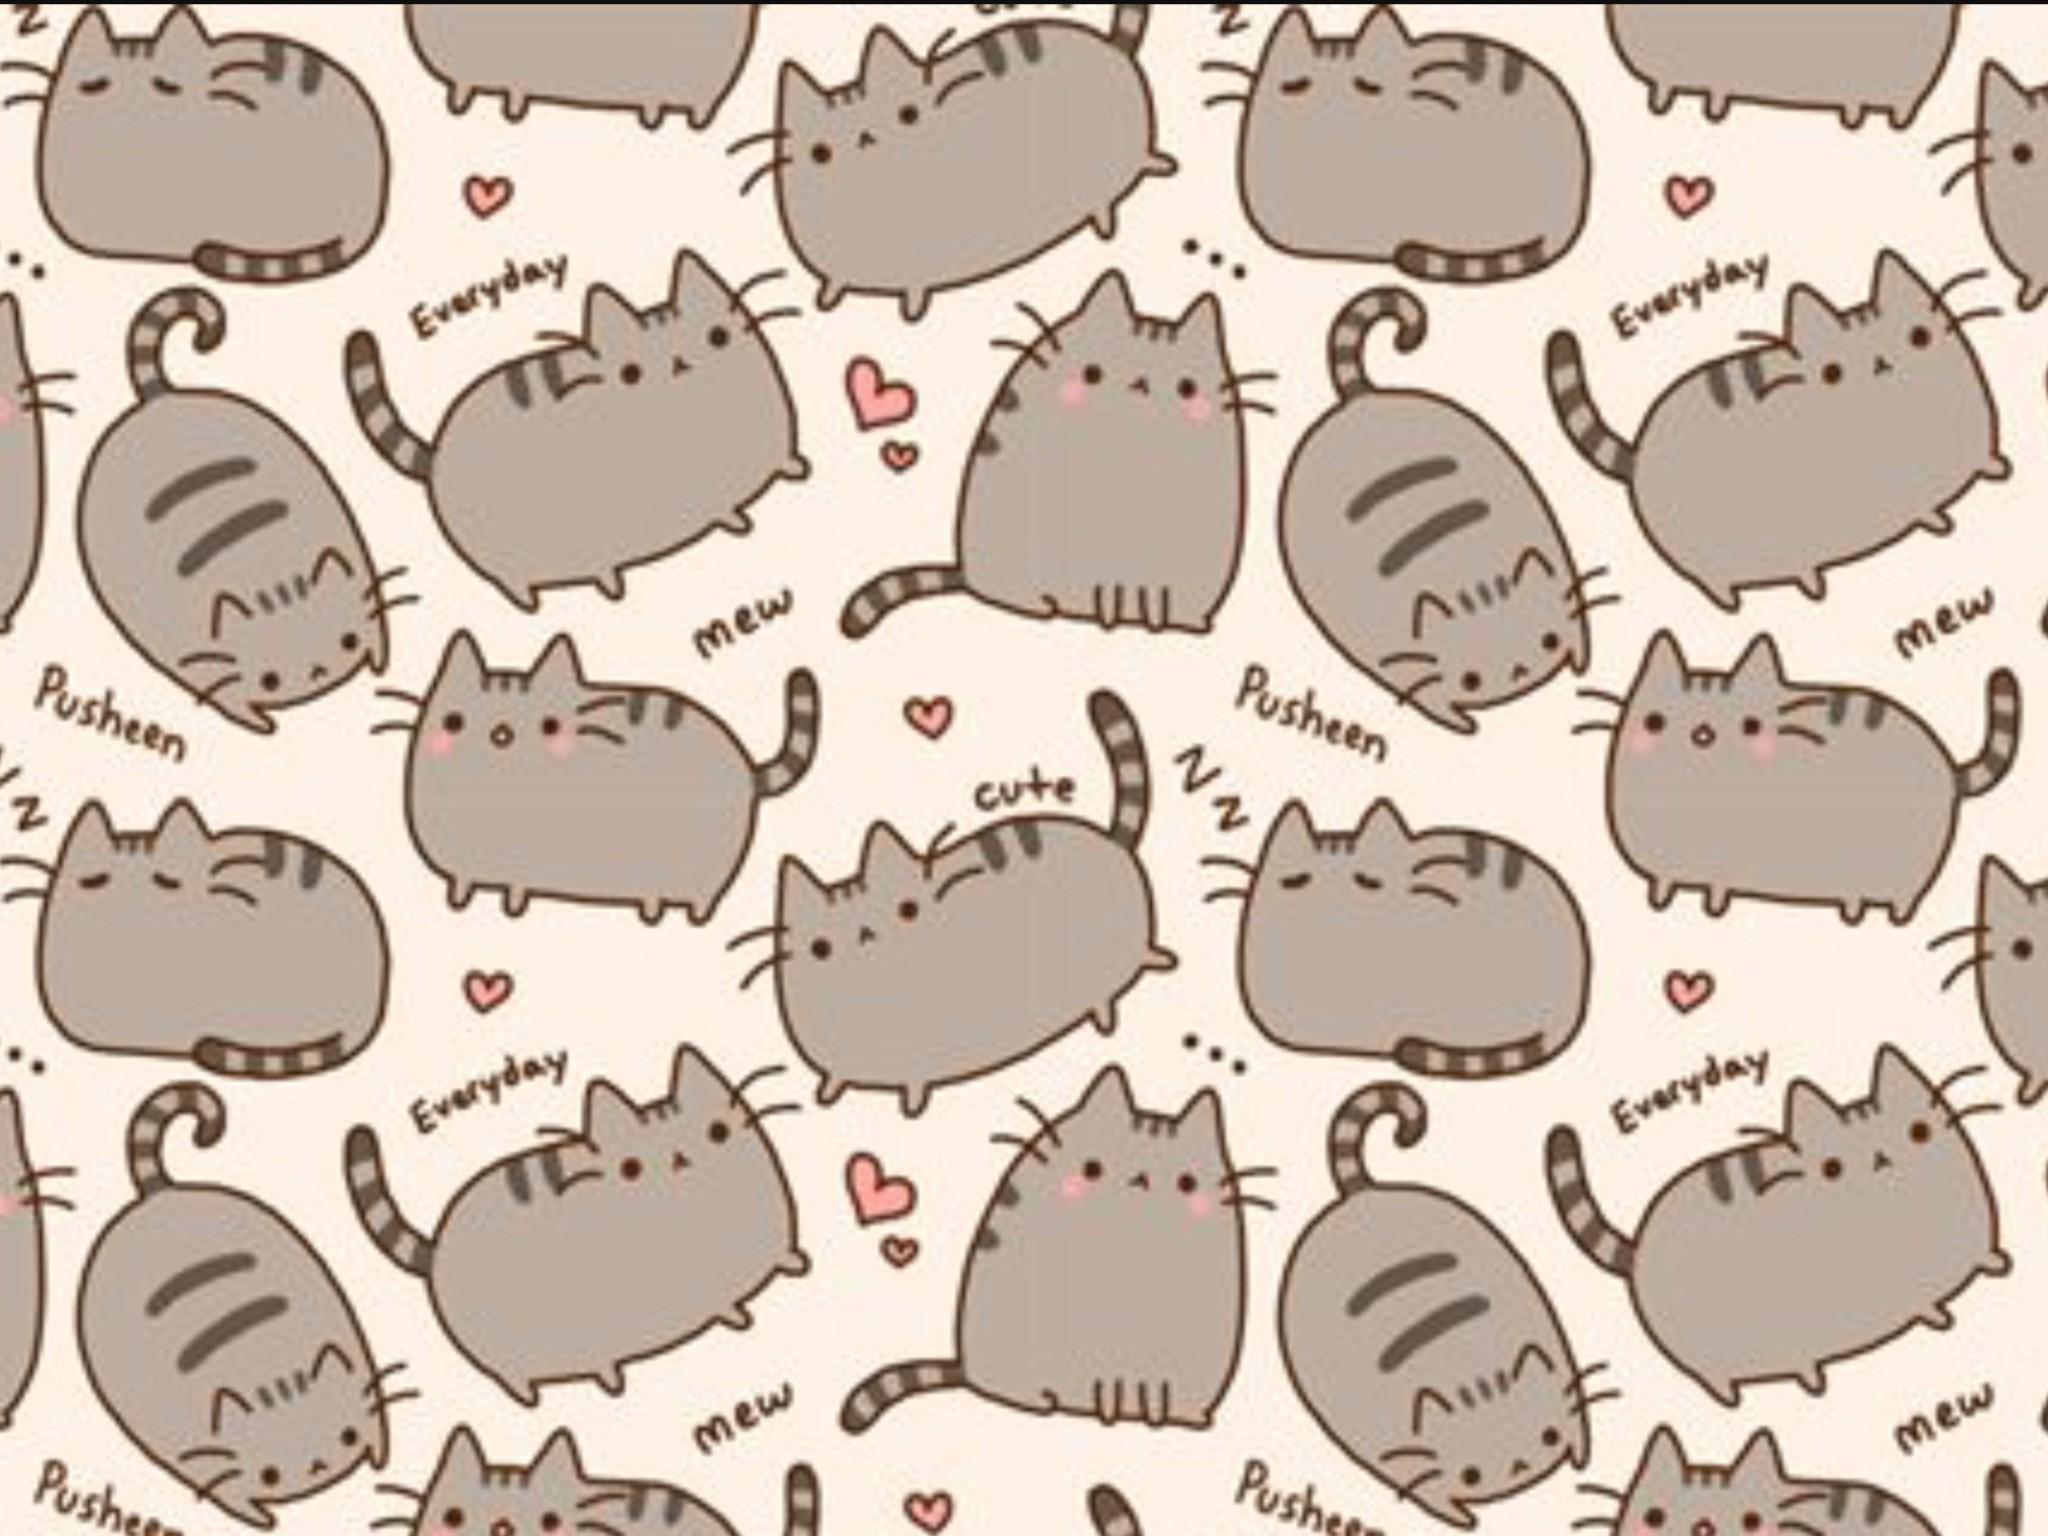 Pusheen Iphone Wallpaper Cute Pusheen Wallpaper 183 ① Download Free Stunning High